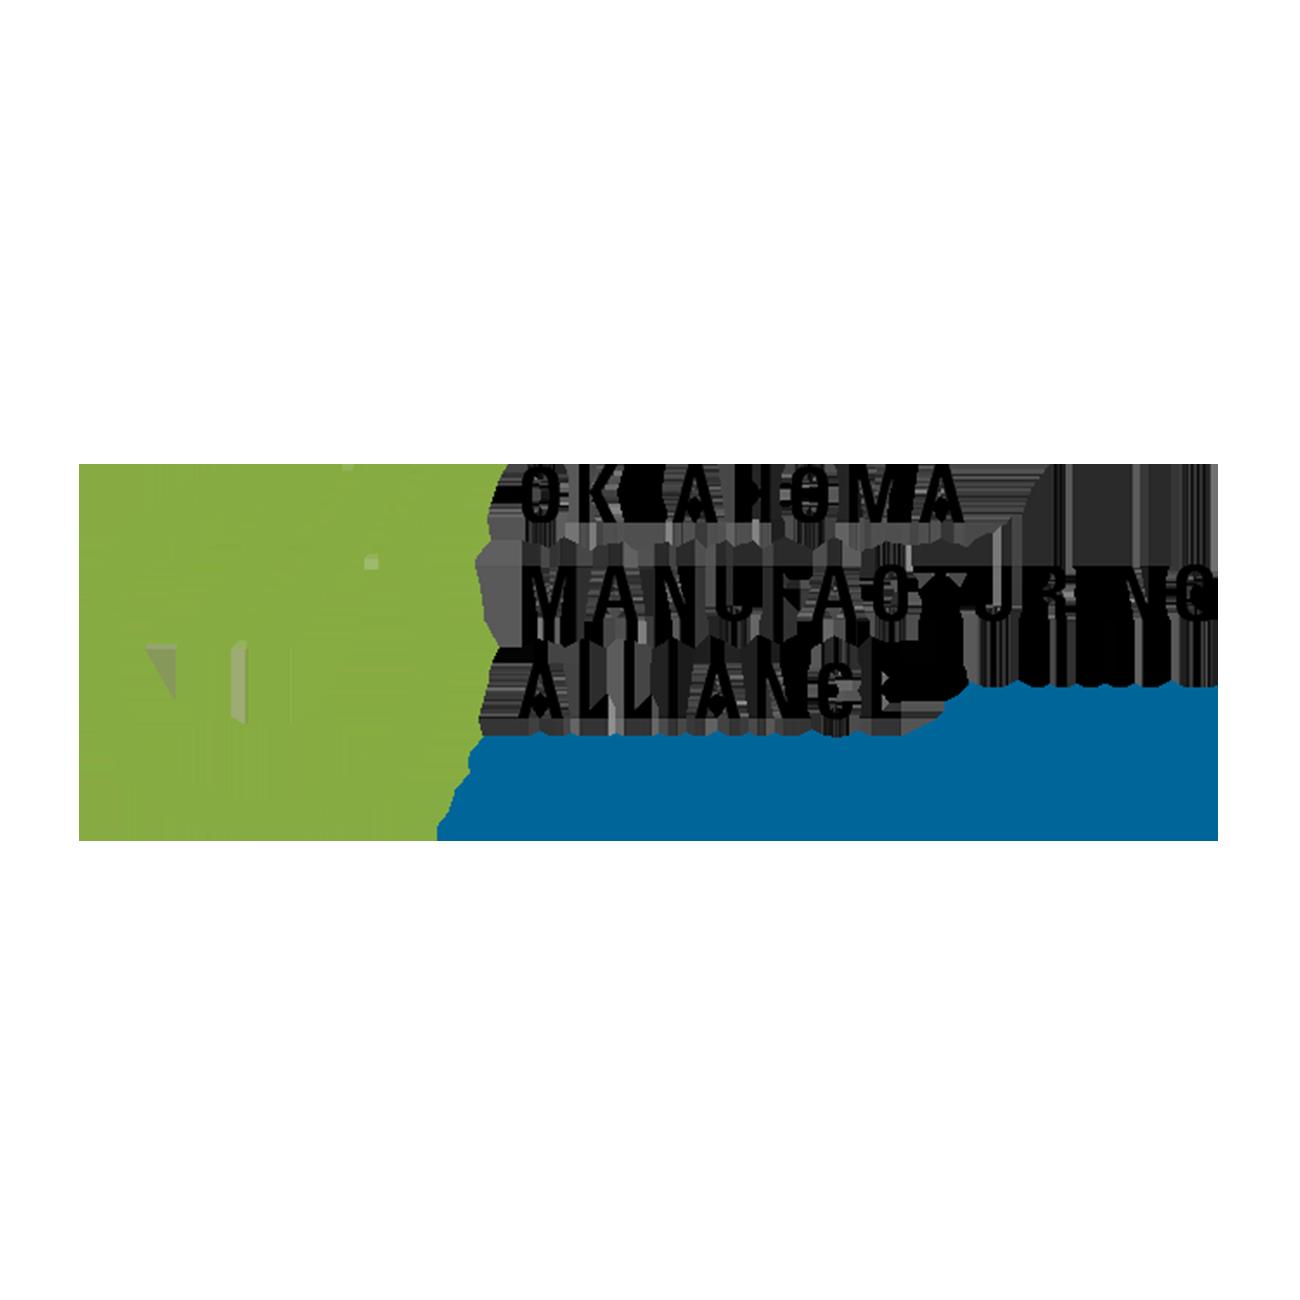 Oklahoma Manufacturing Alliance